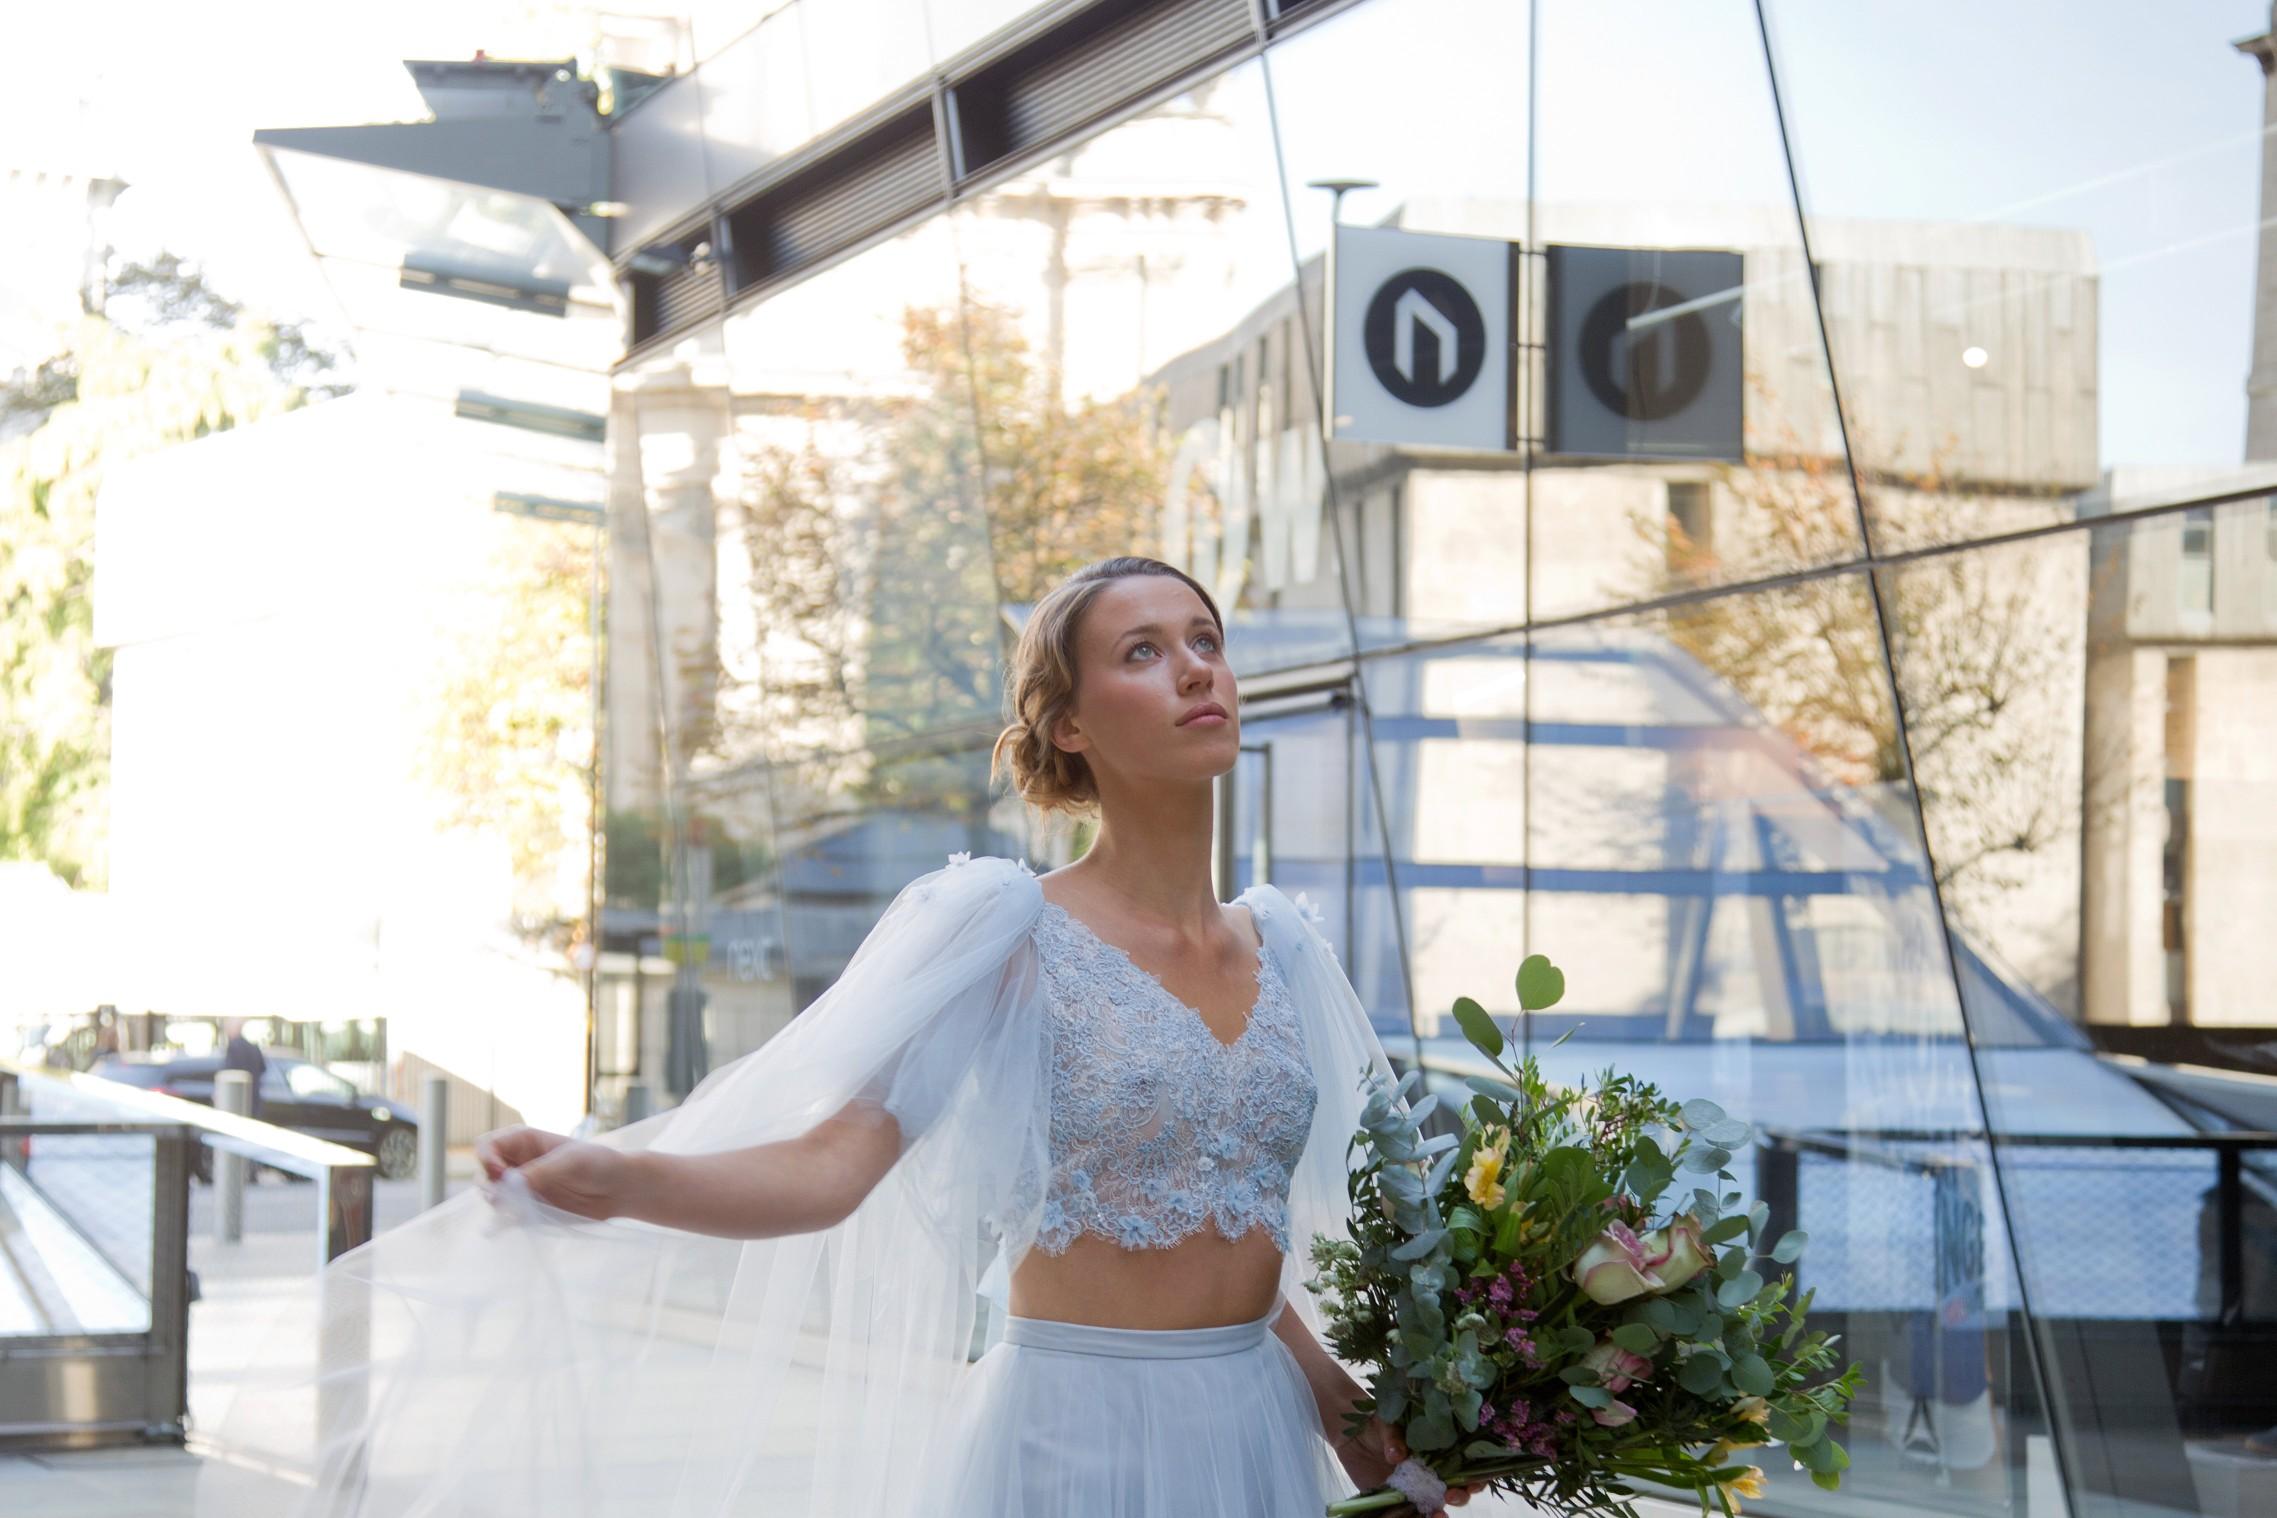 Fiona Elizabeth Couture - Ruth Foran Photography - alternative wedding dress - unique bridalwear 2 (2)